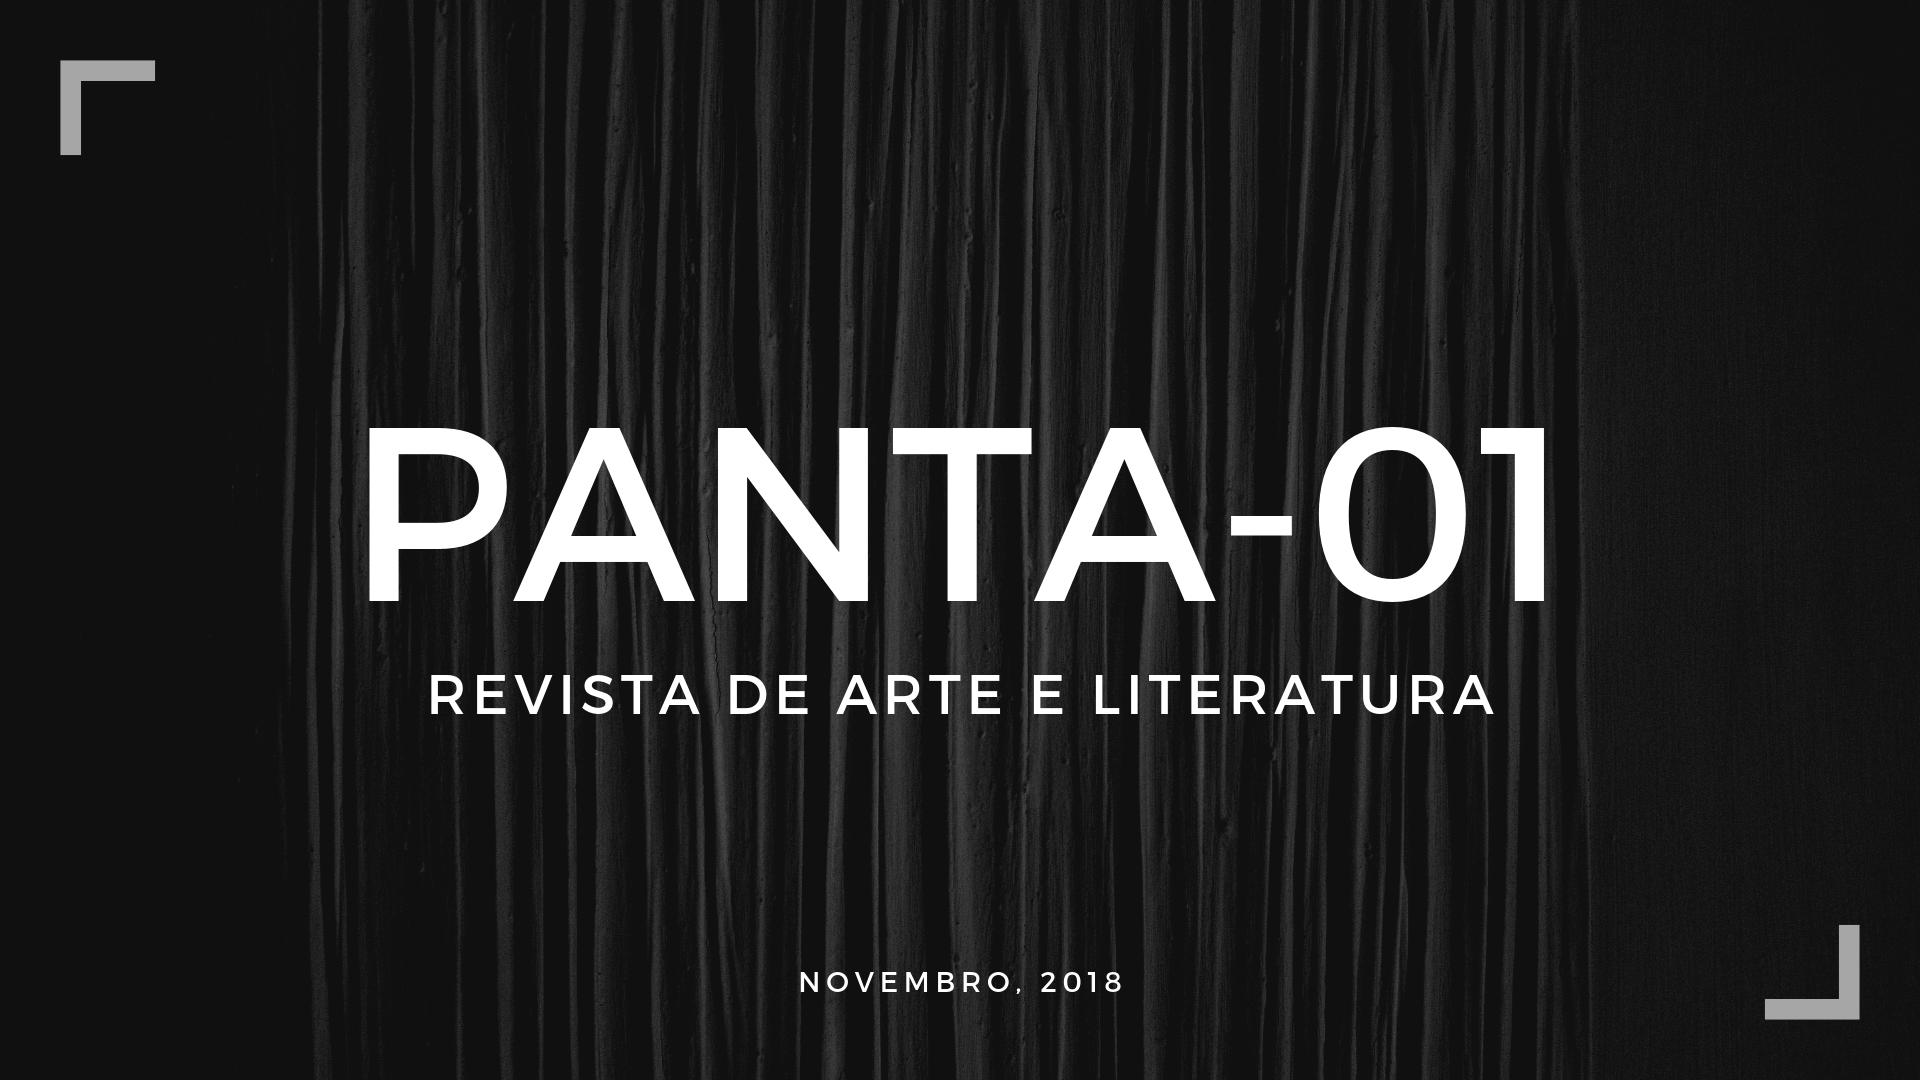 Panta-01: Revista de arte e literatura.